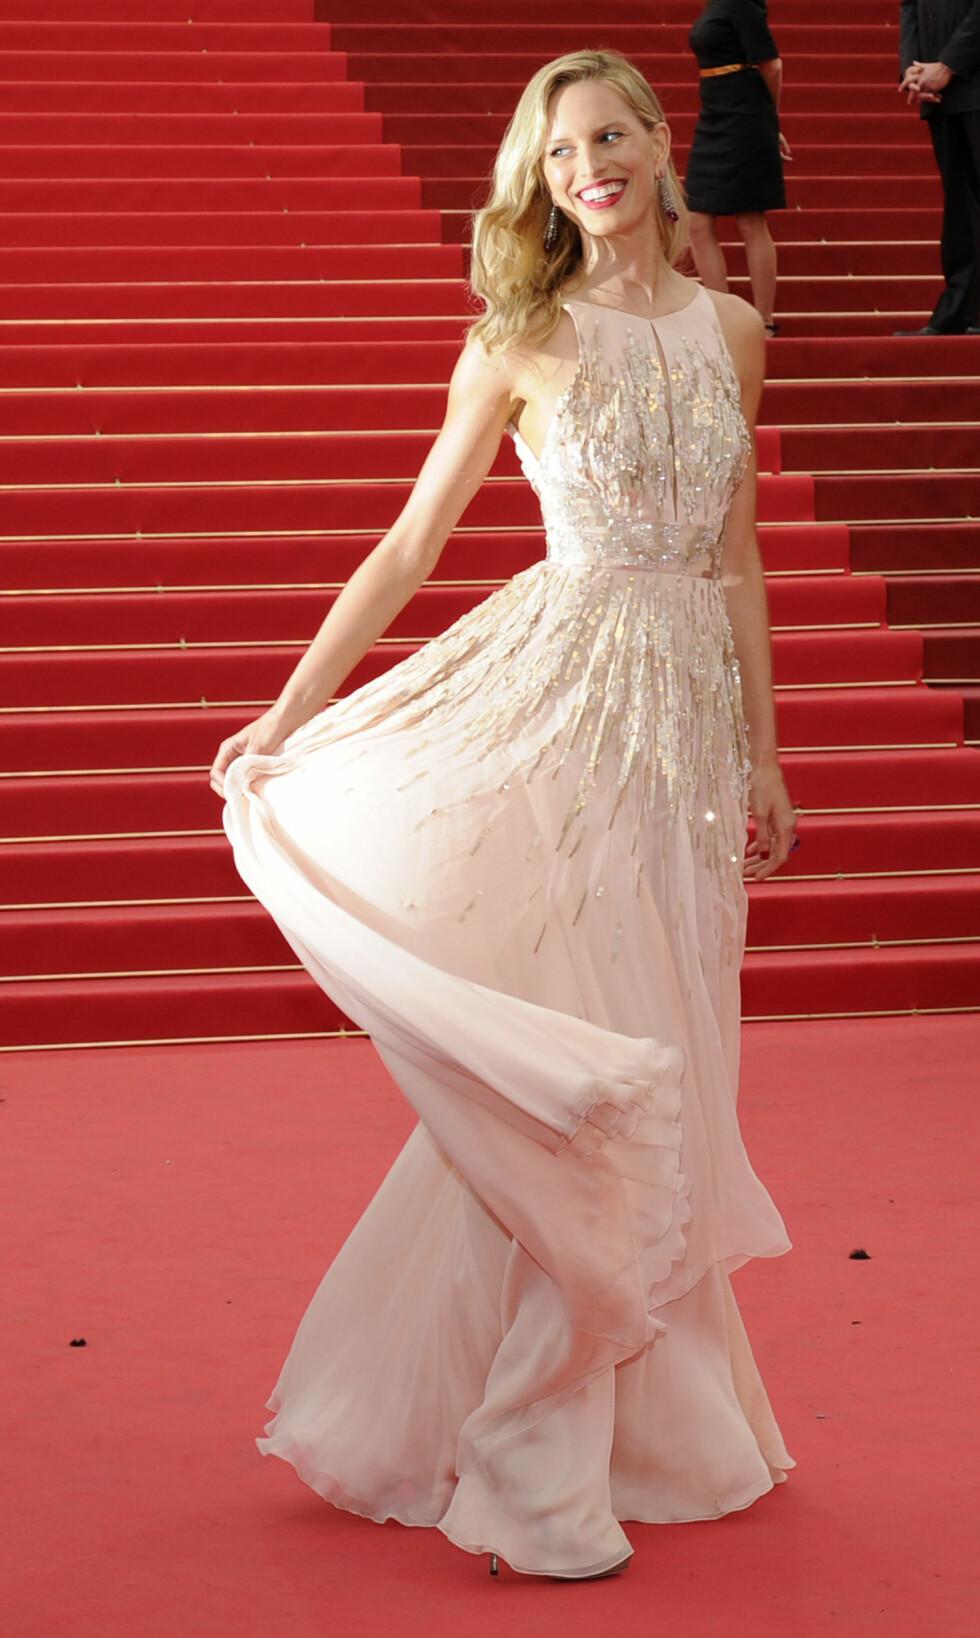 Supermodell Karolina Kurkova, 2011. Foto: Scanpix